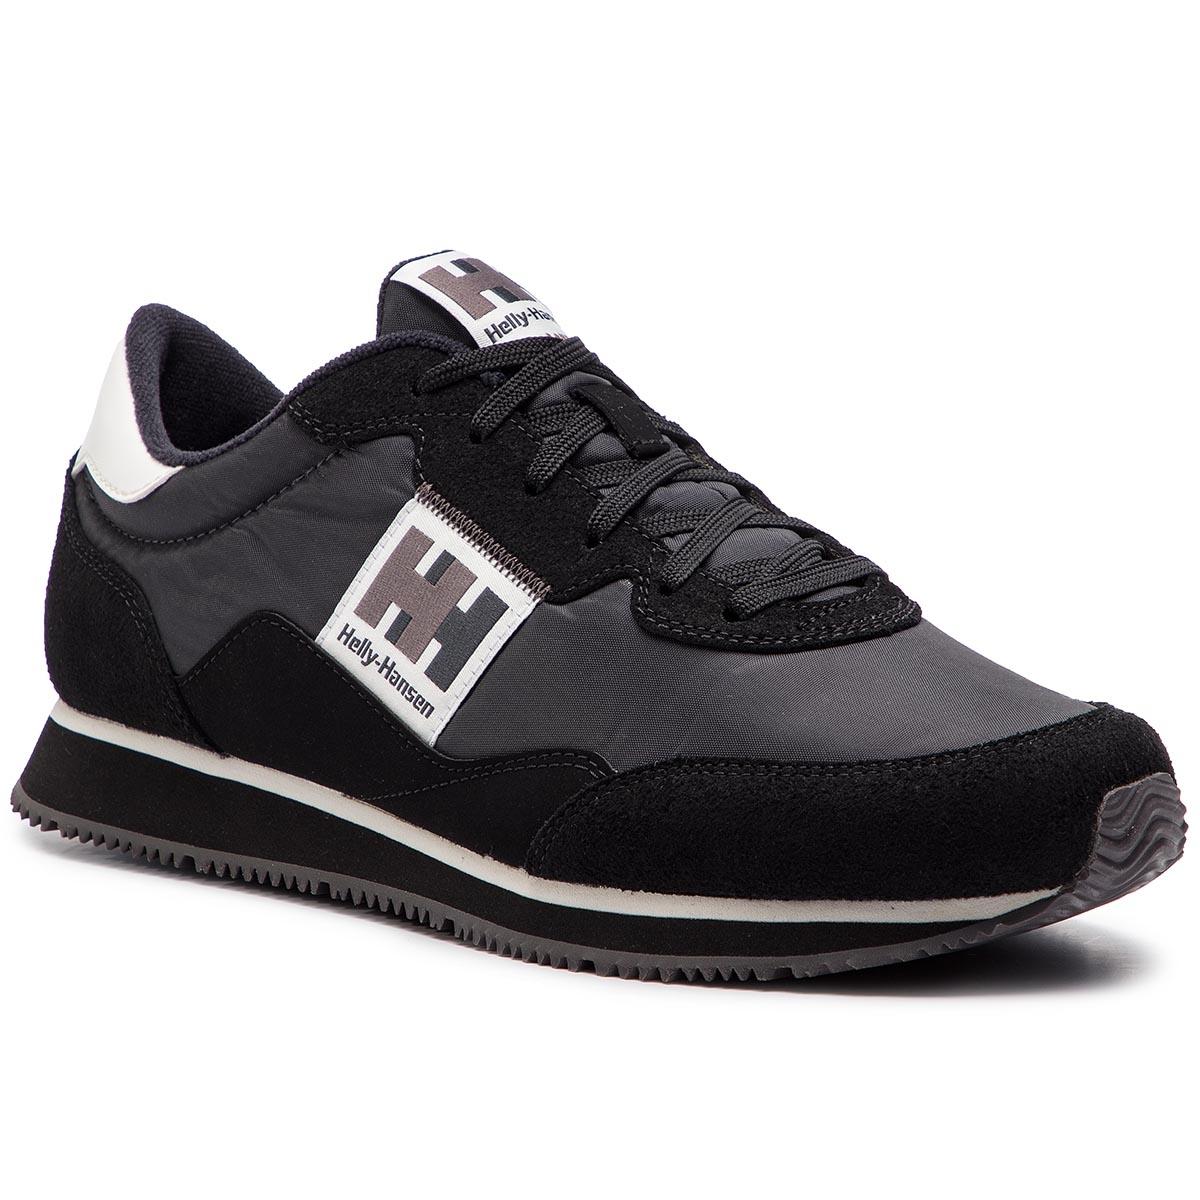 8d15db3312db4 Sneakers HELLY HANSEN Ripples Low-Cut Sneaker 114-81.990 Black Phantom Off  White